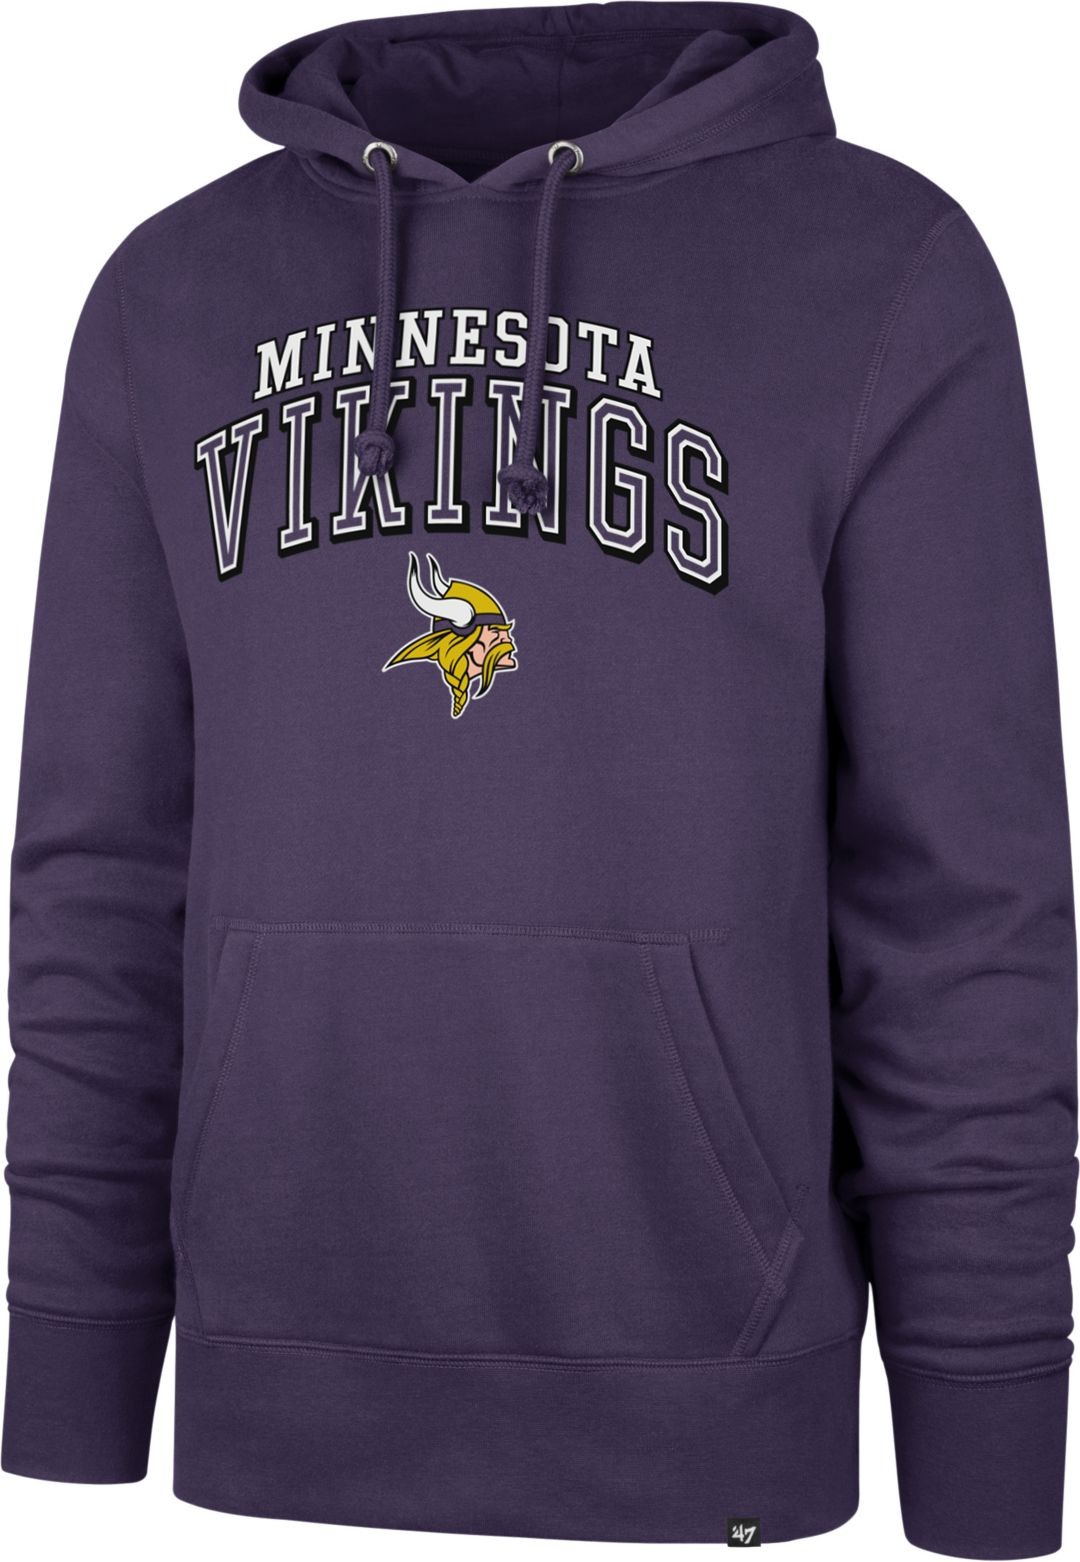 reputable site e152d 60b3d '47 Men's Minnesota Vikings Headline Purple Hoodie